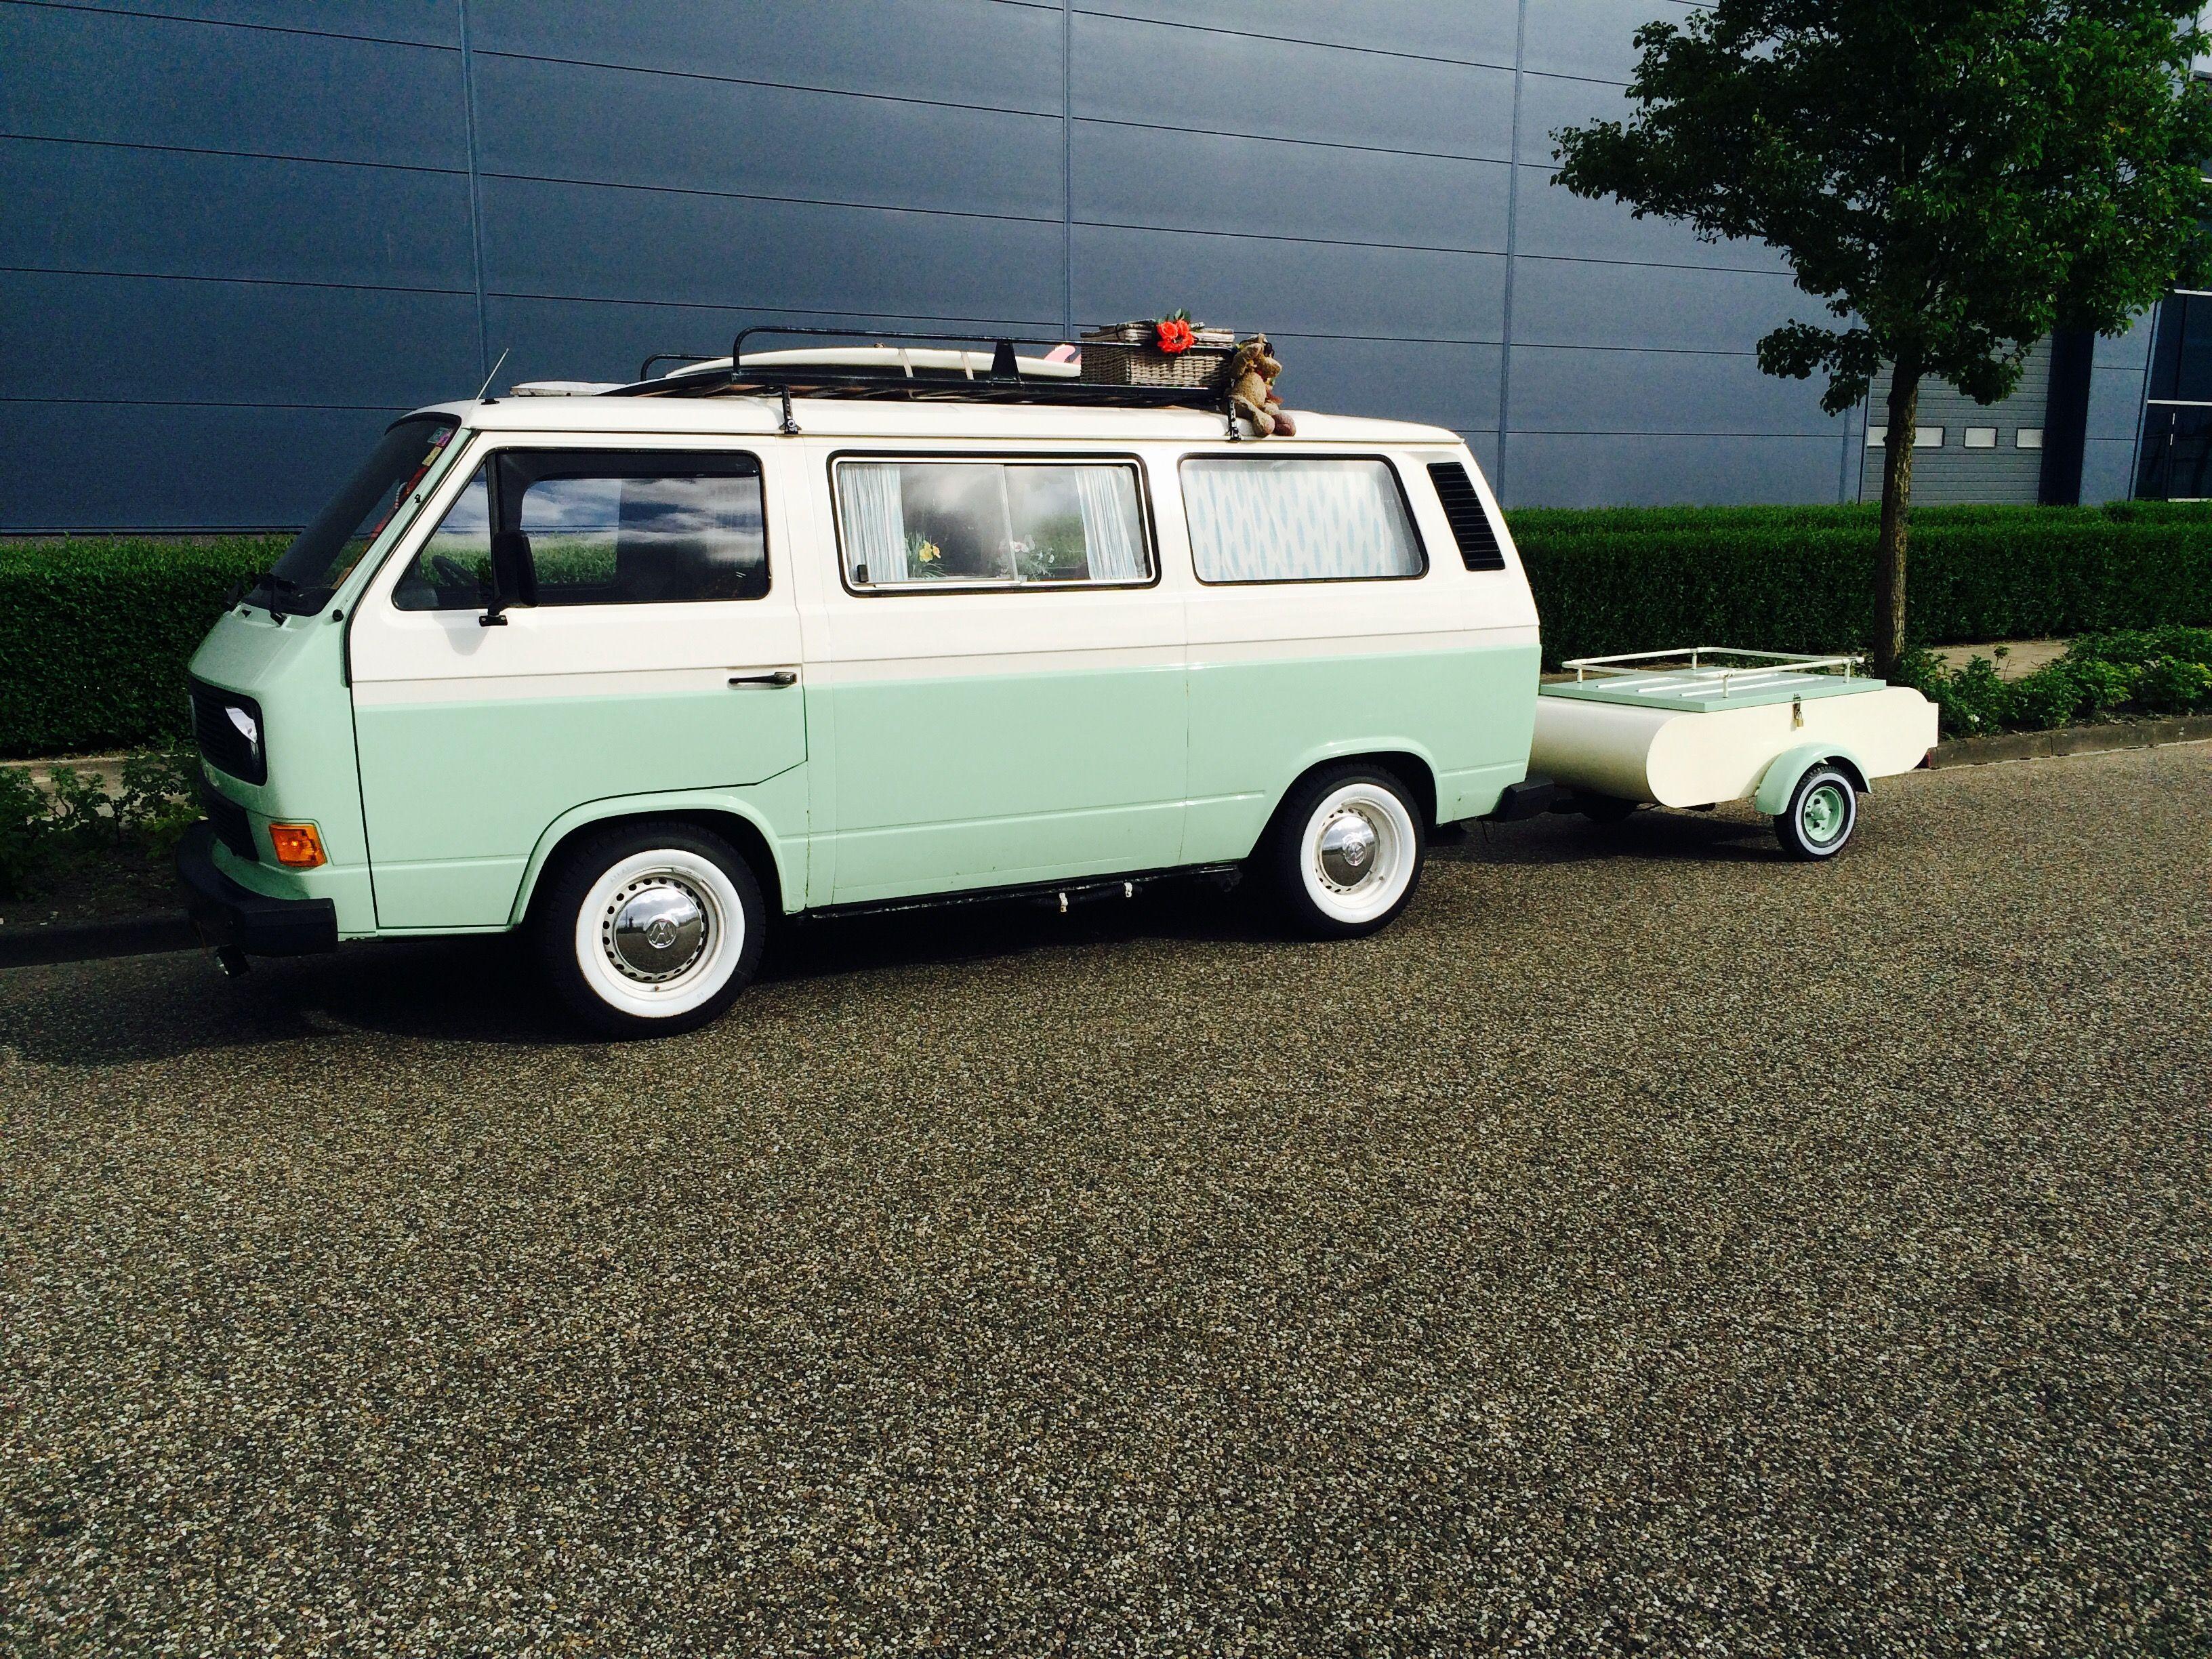 Pin By Aubree24roberts59 On Van Life In 2020 Vw Wagon Vw Vanagon Vw Campervan